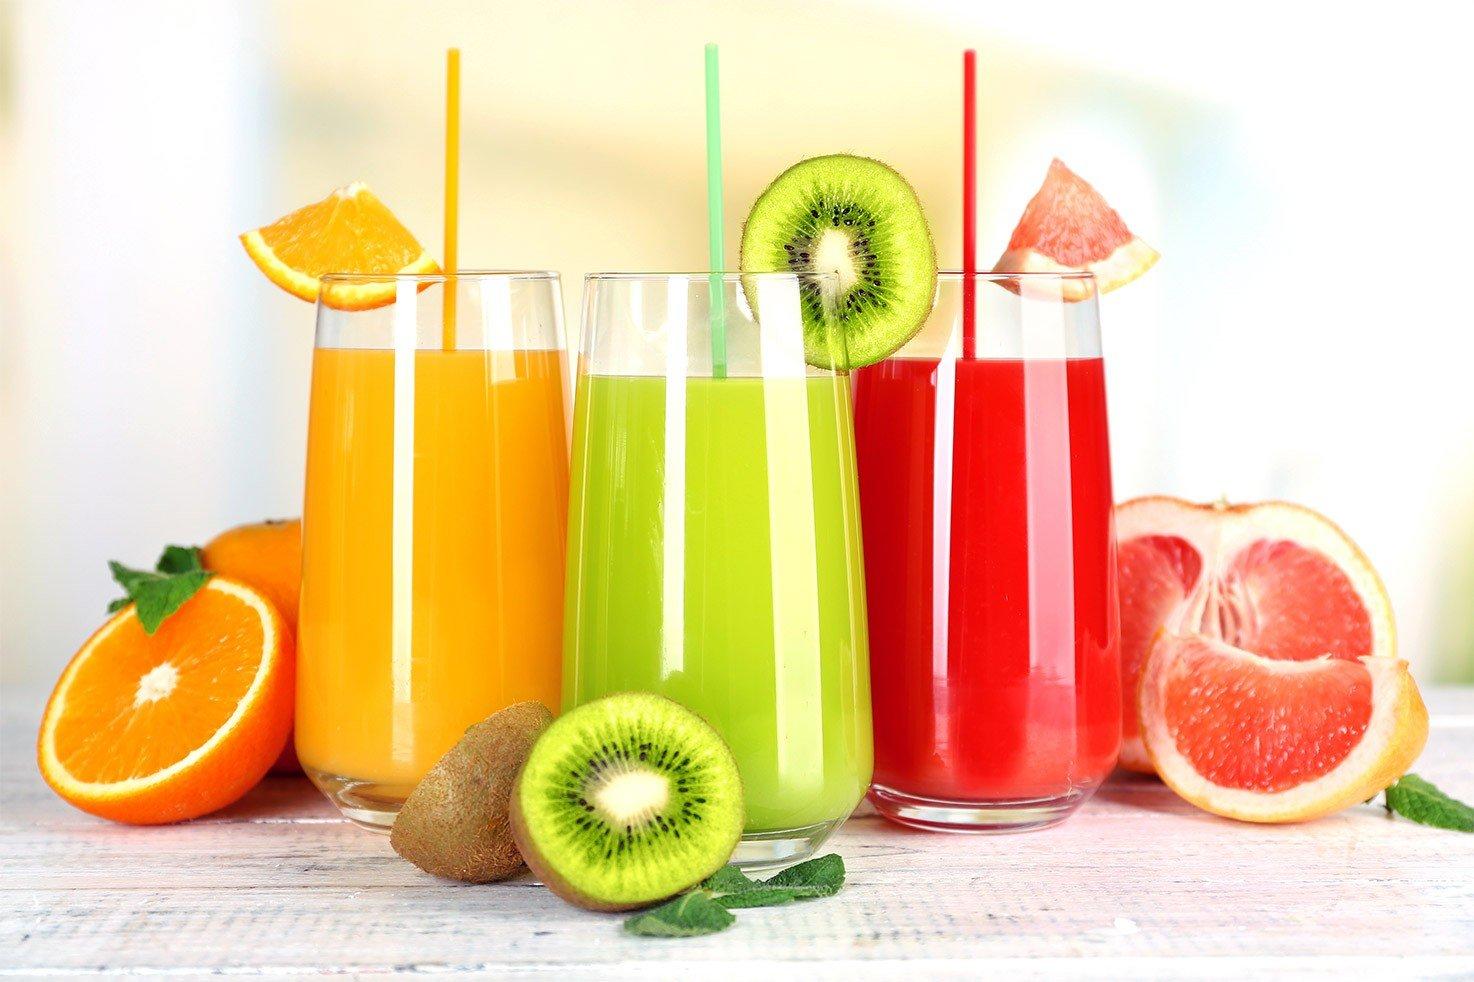 Three kinds of juices like orange, kiwi, grapefruit | Hurry The Food Up